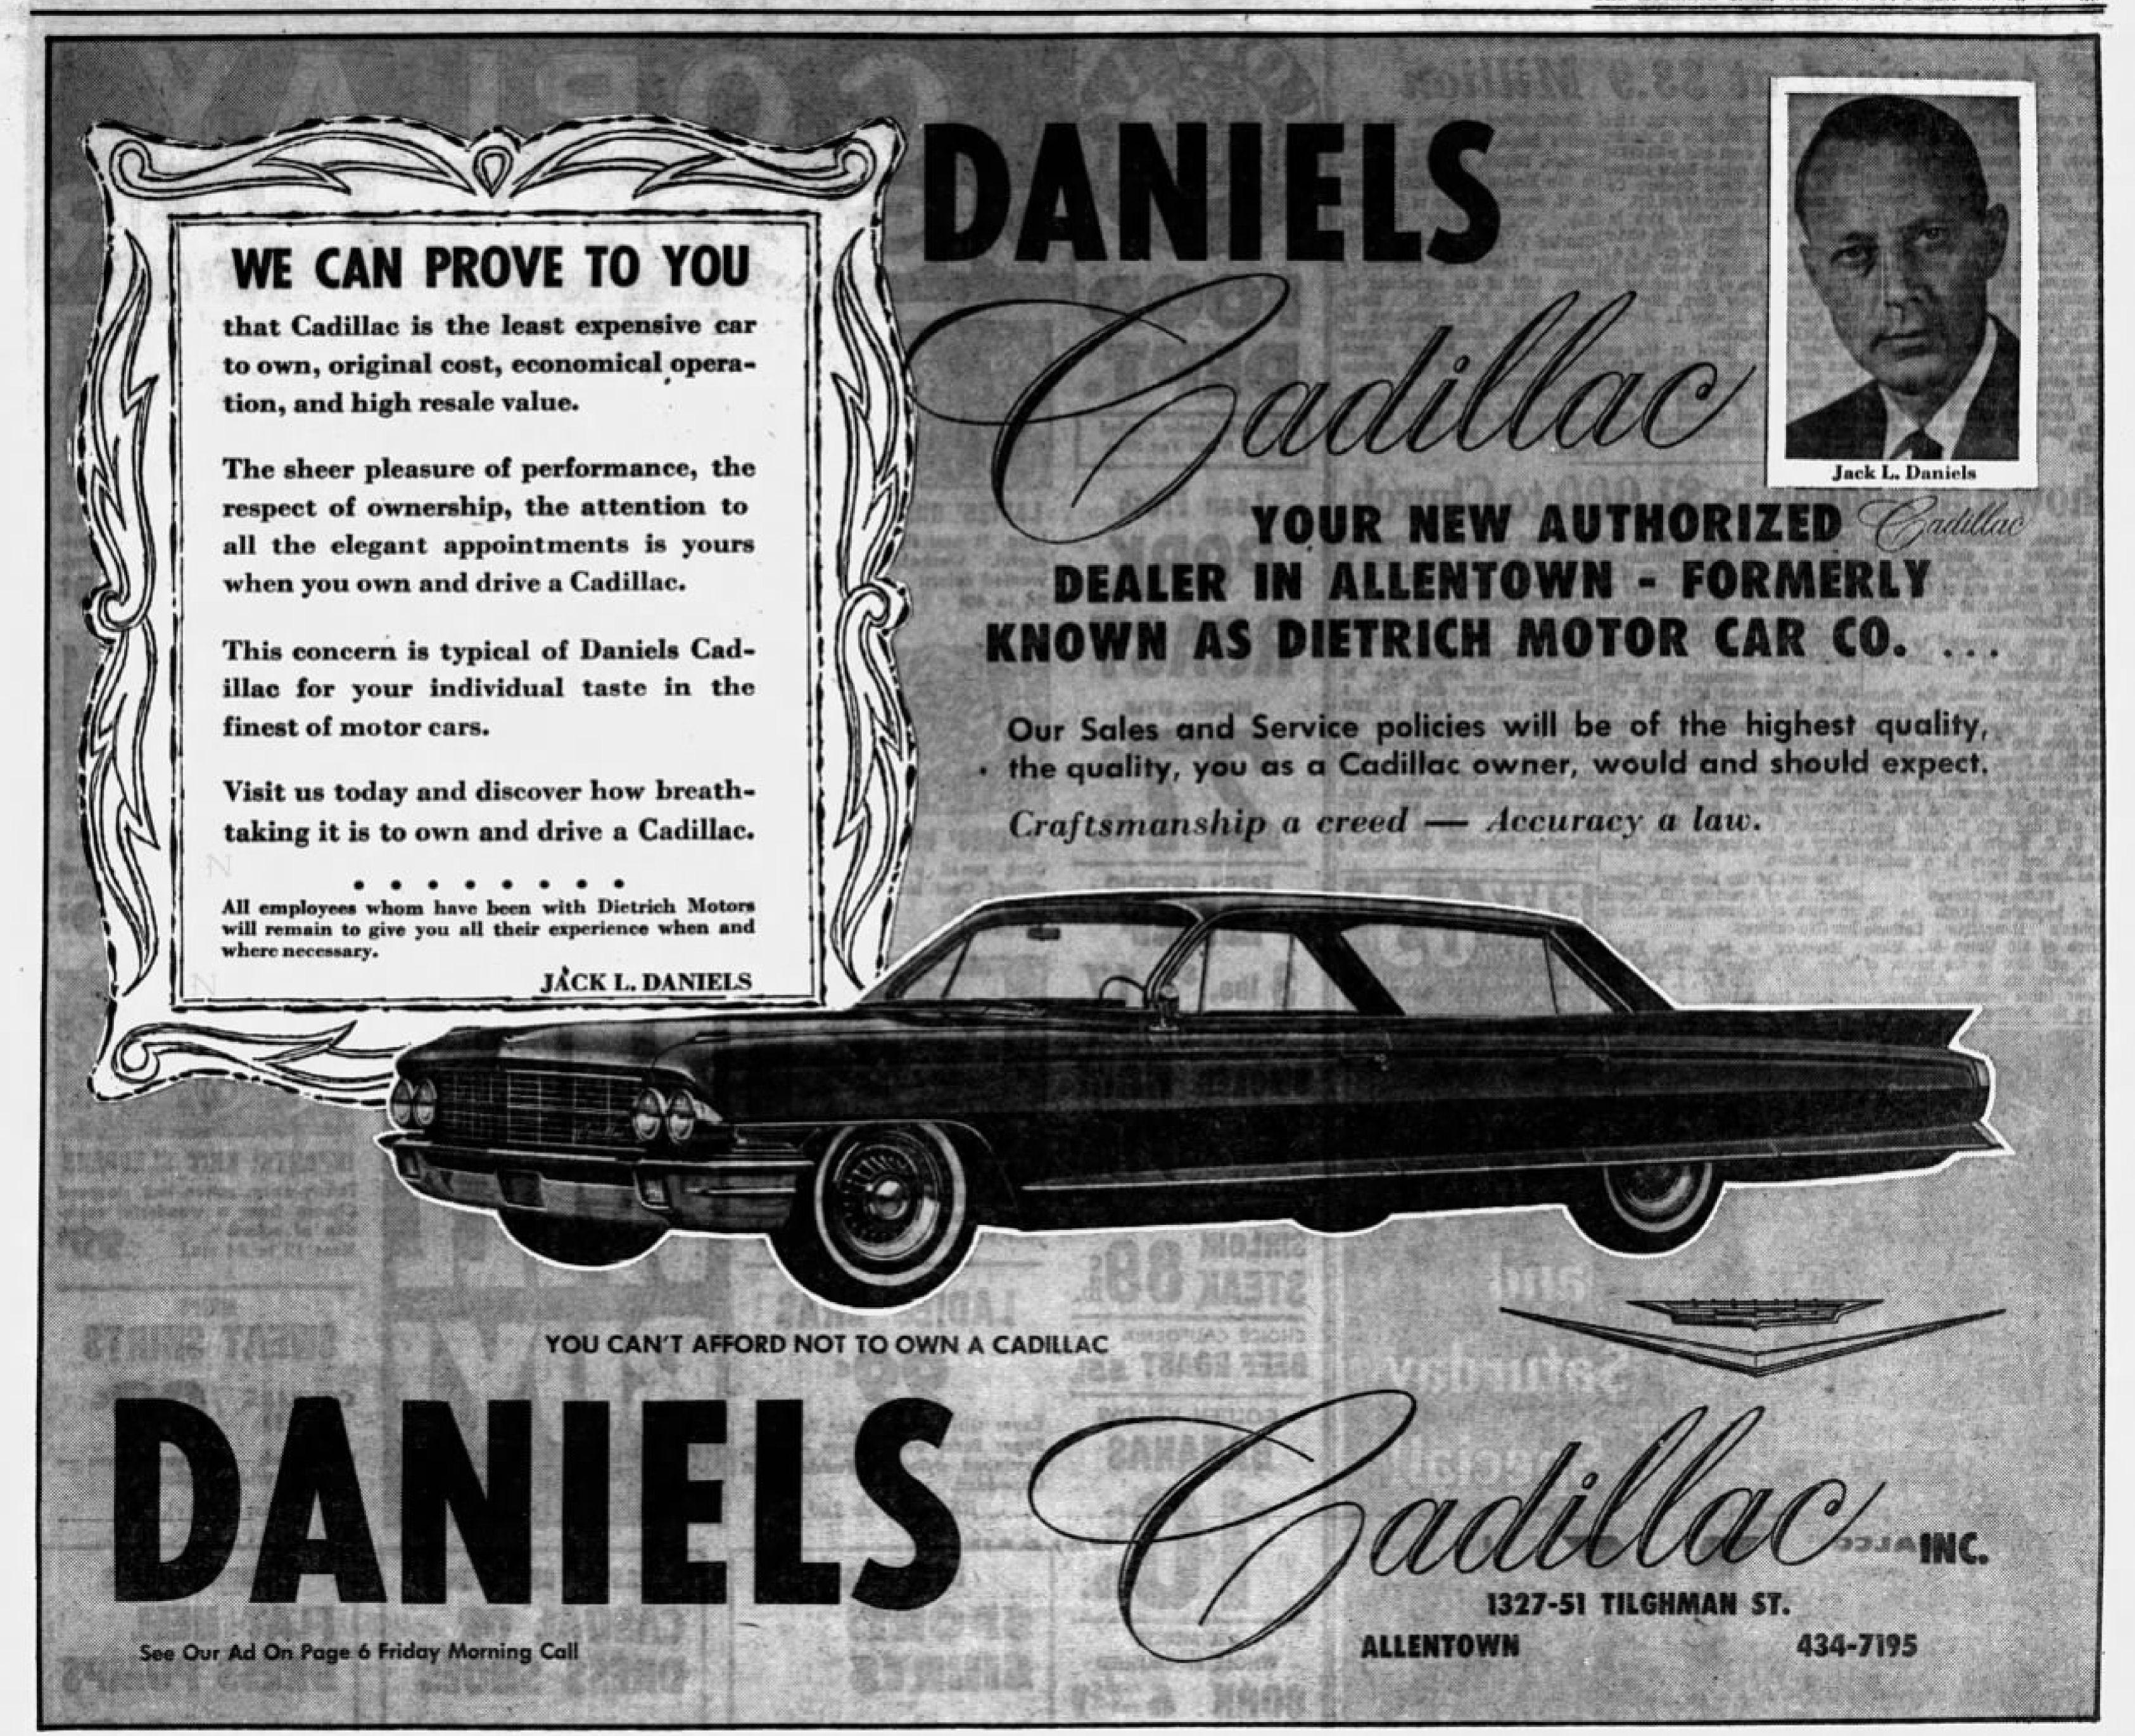 File:1962 - Daniels Cadillac - 16 Feb MC - Allentown PA.jpg ...